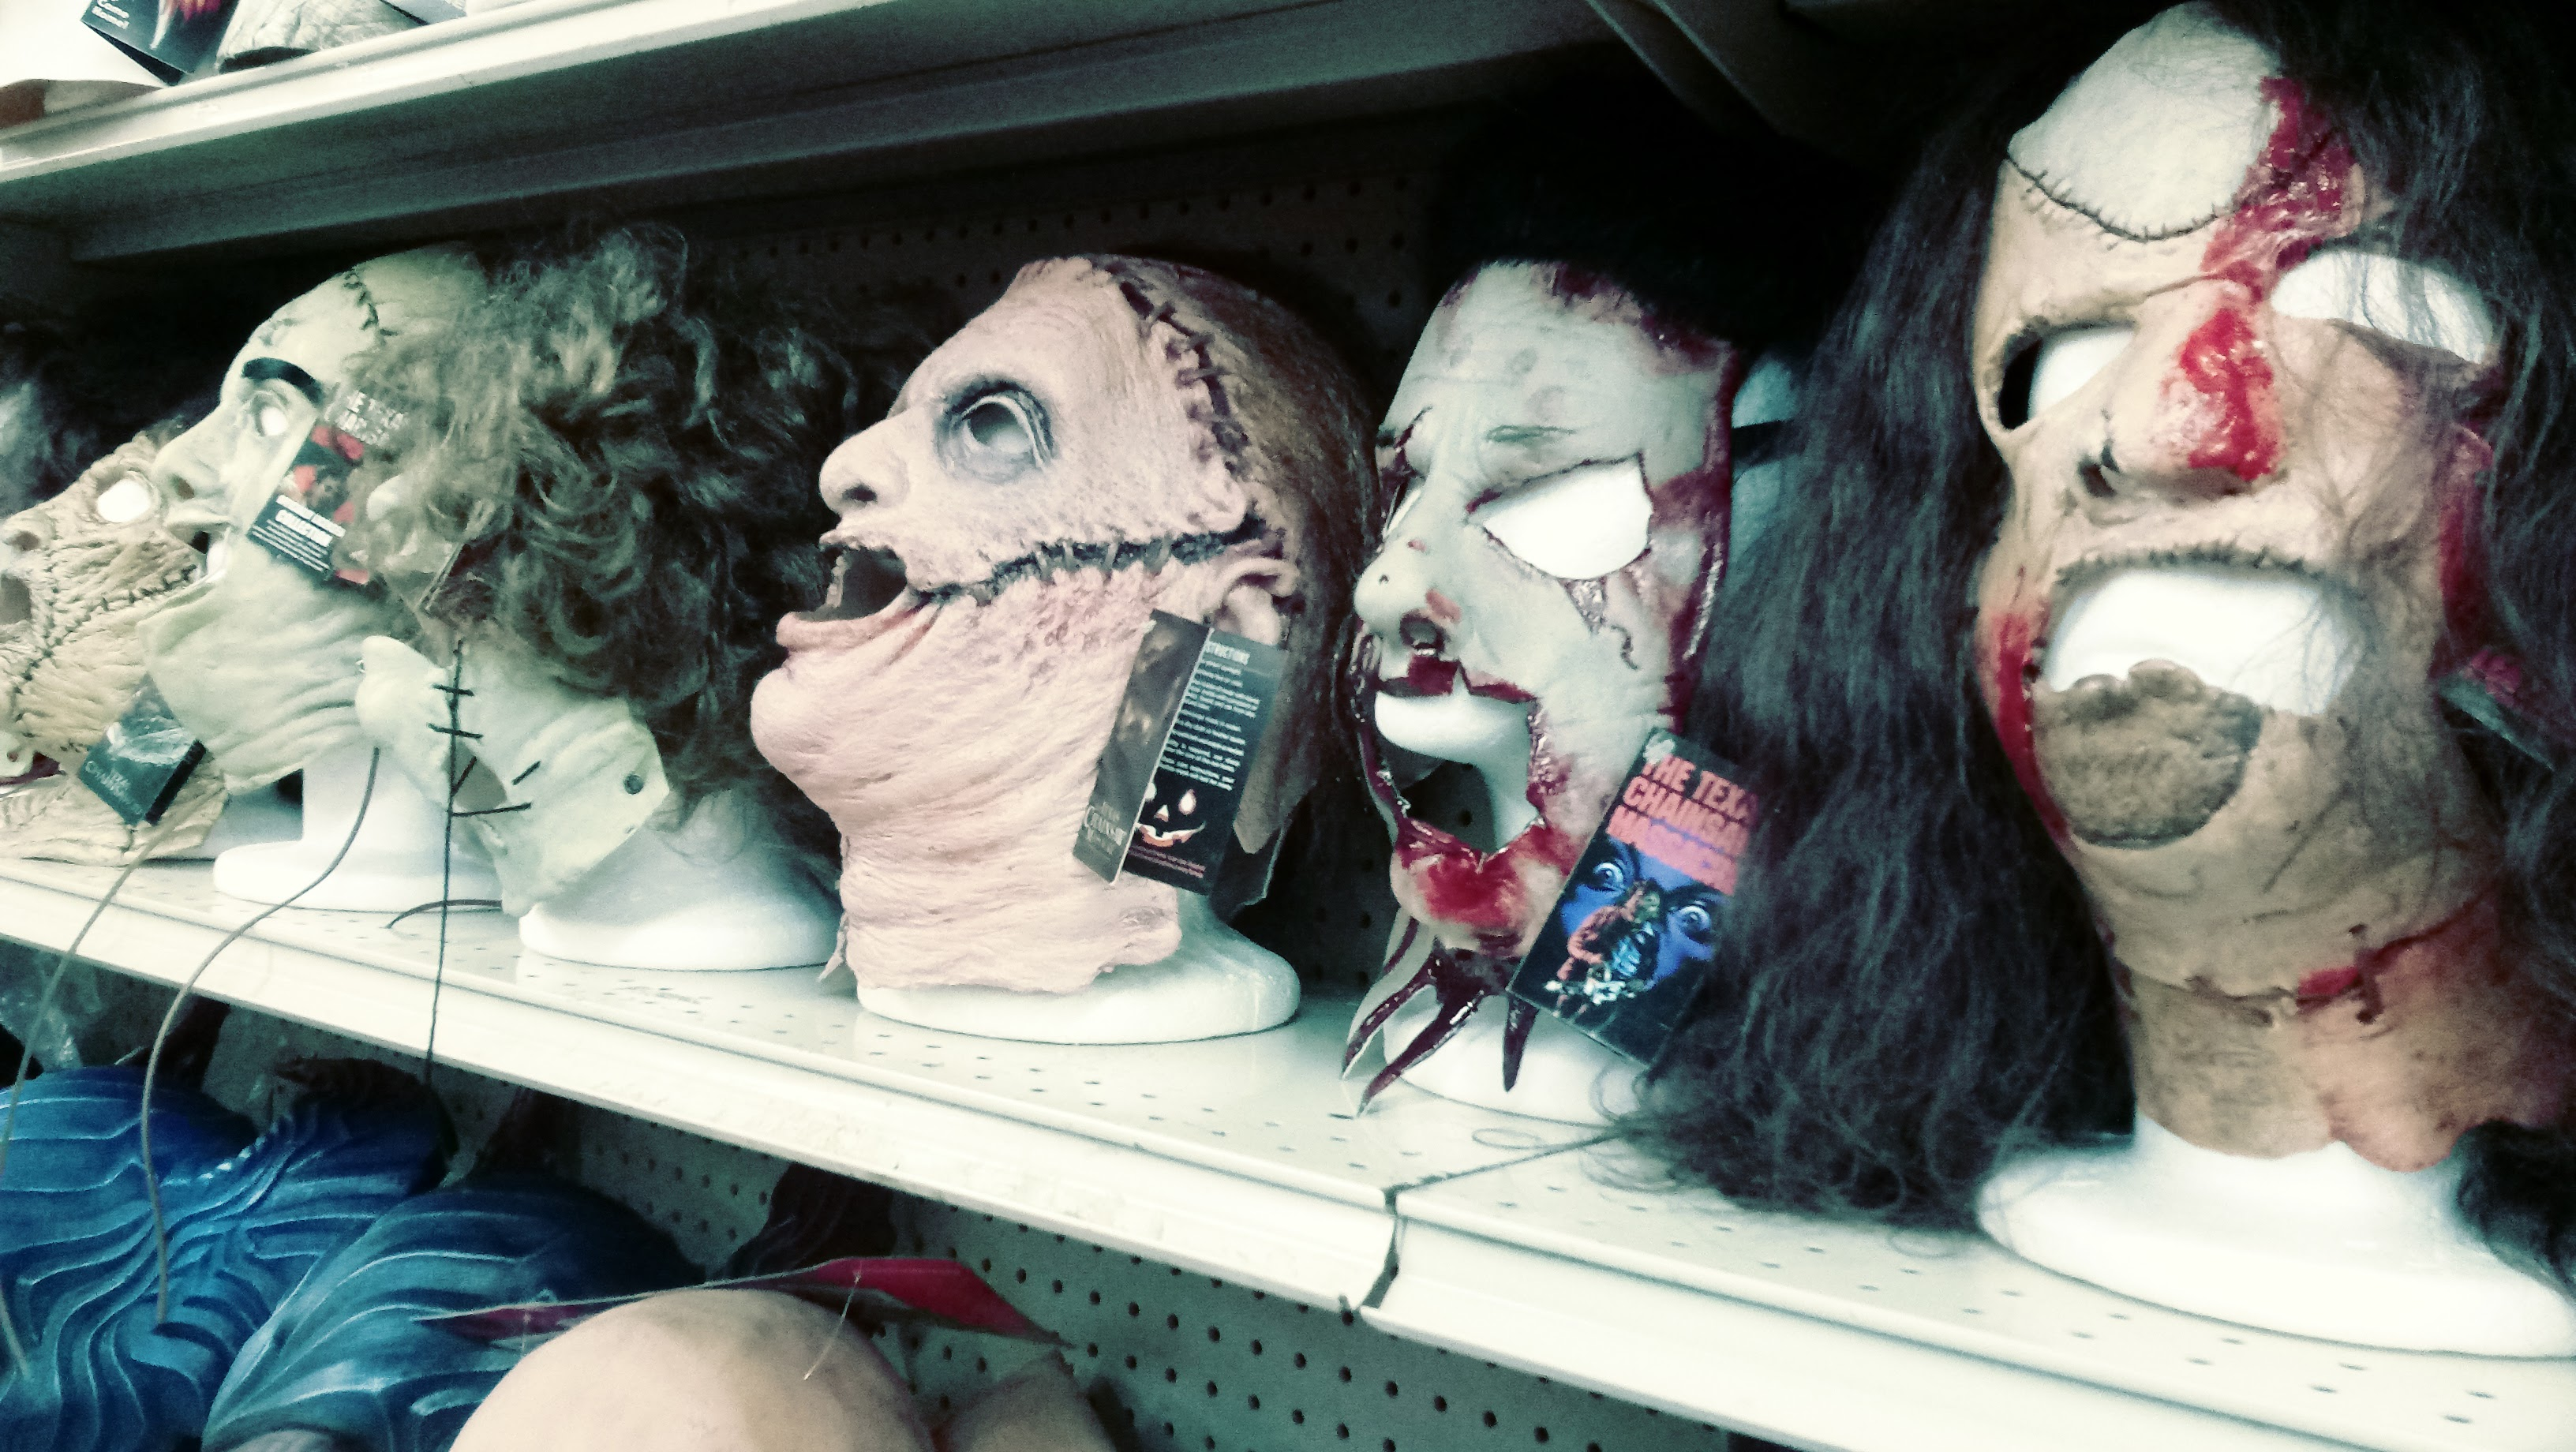 nick nackery leatherface ed gein texas chainsaw massacre masks